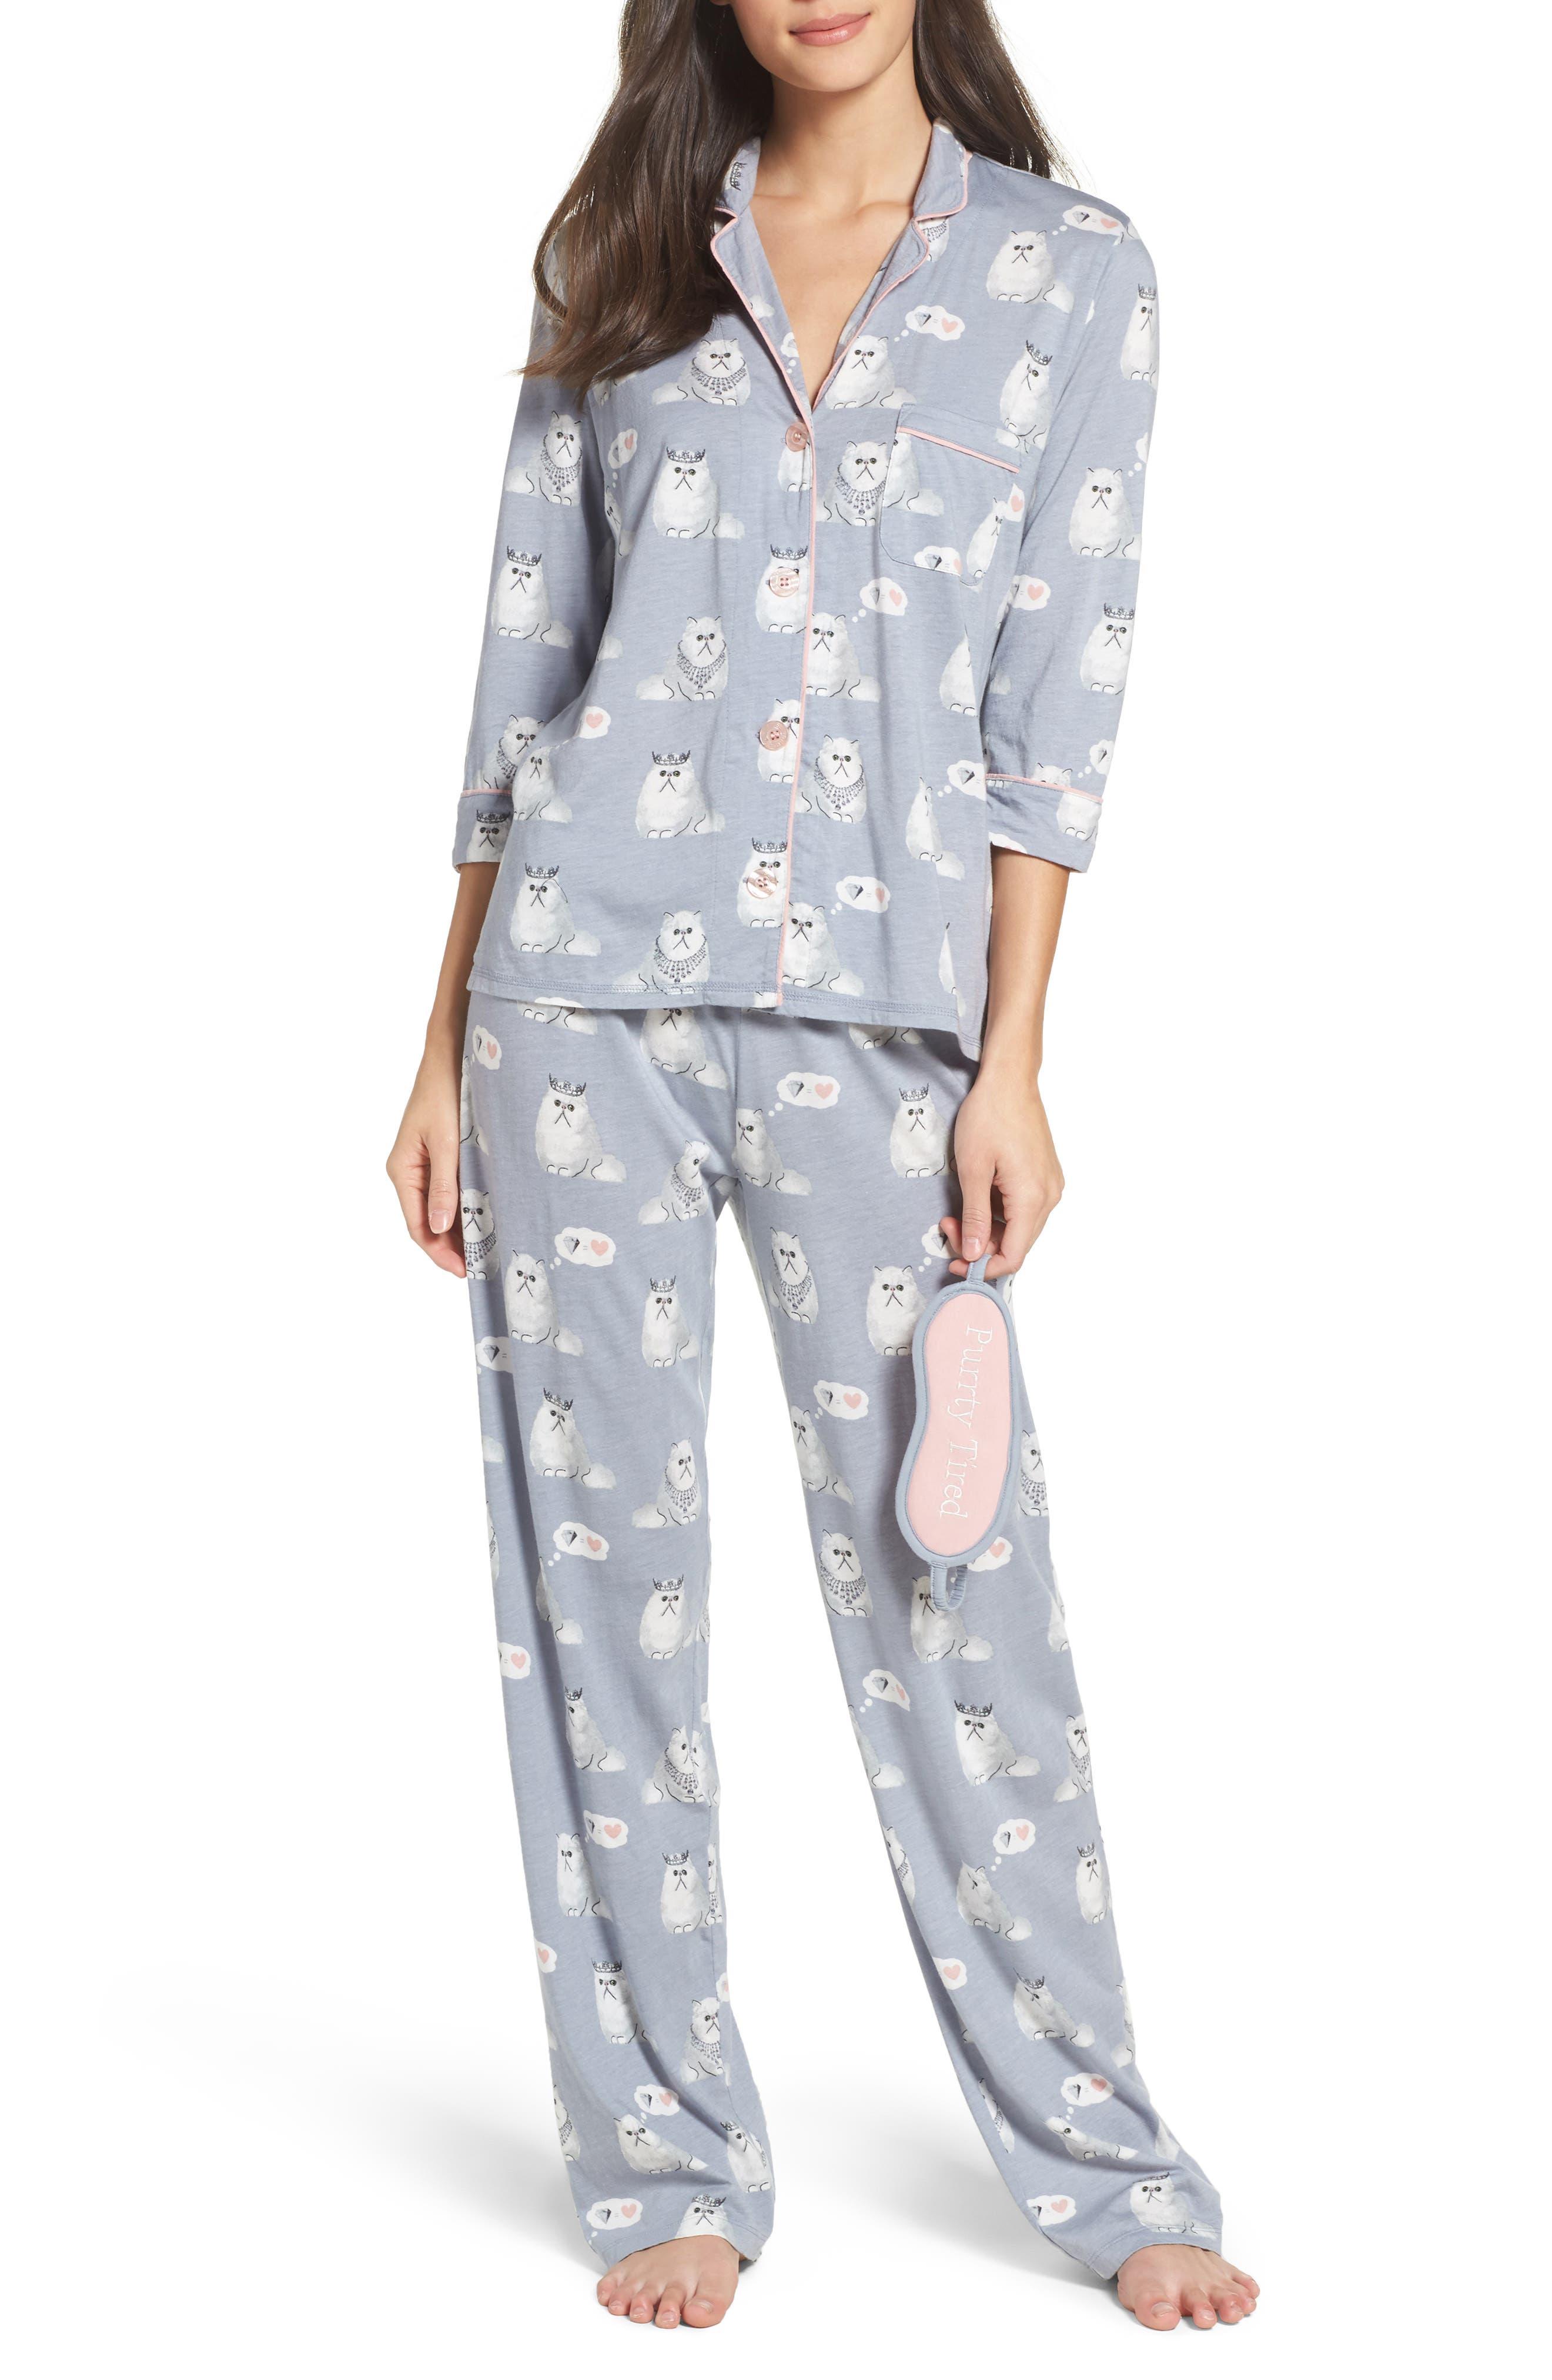 Alternate Image 1 Selected - PJ Salvage Playful Print Pajamas & Eye Mask